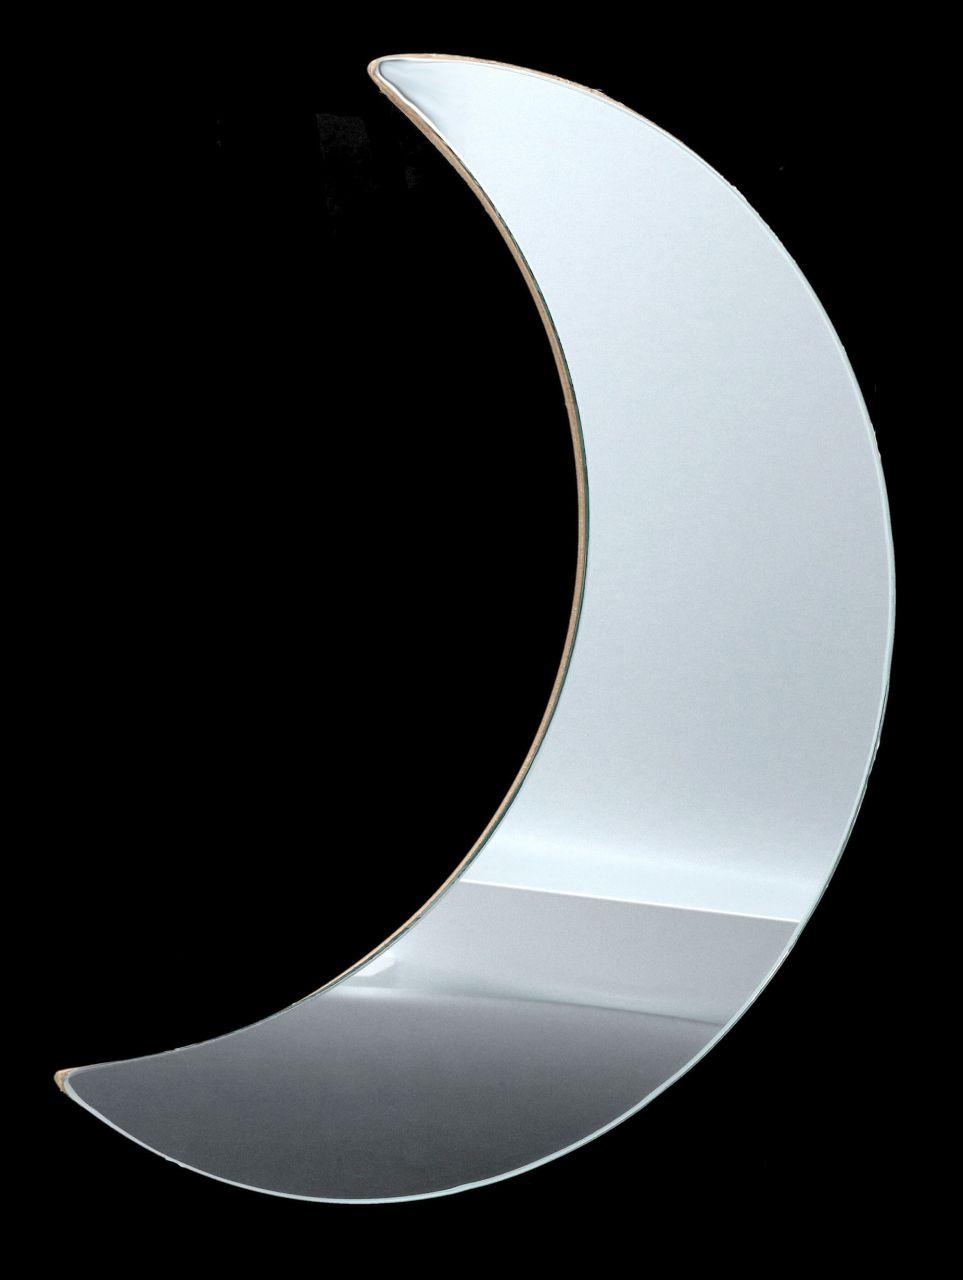 Mirror Cresent Moon